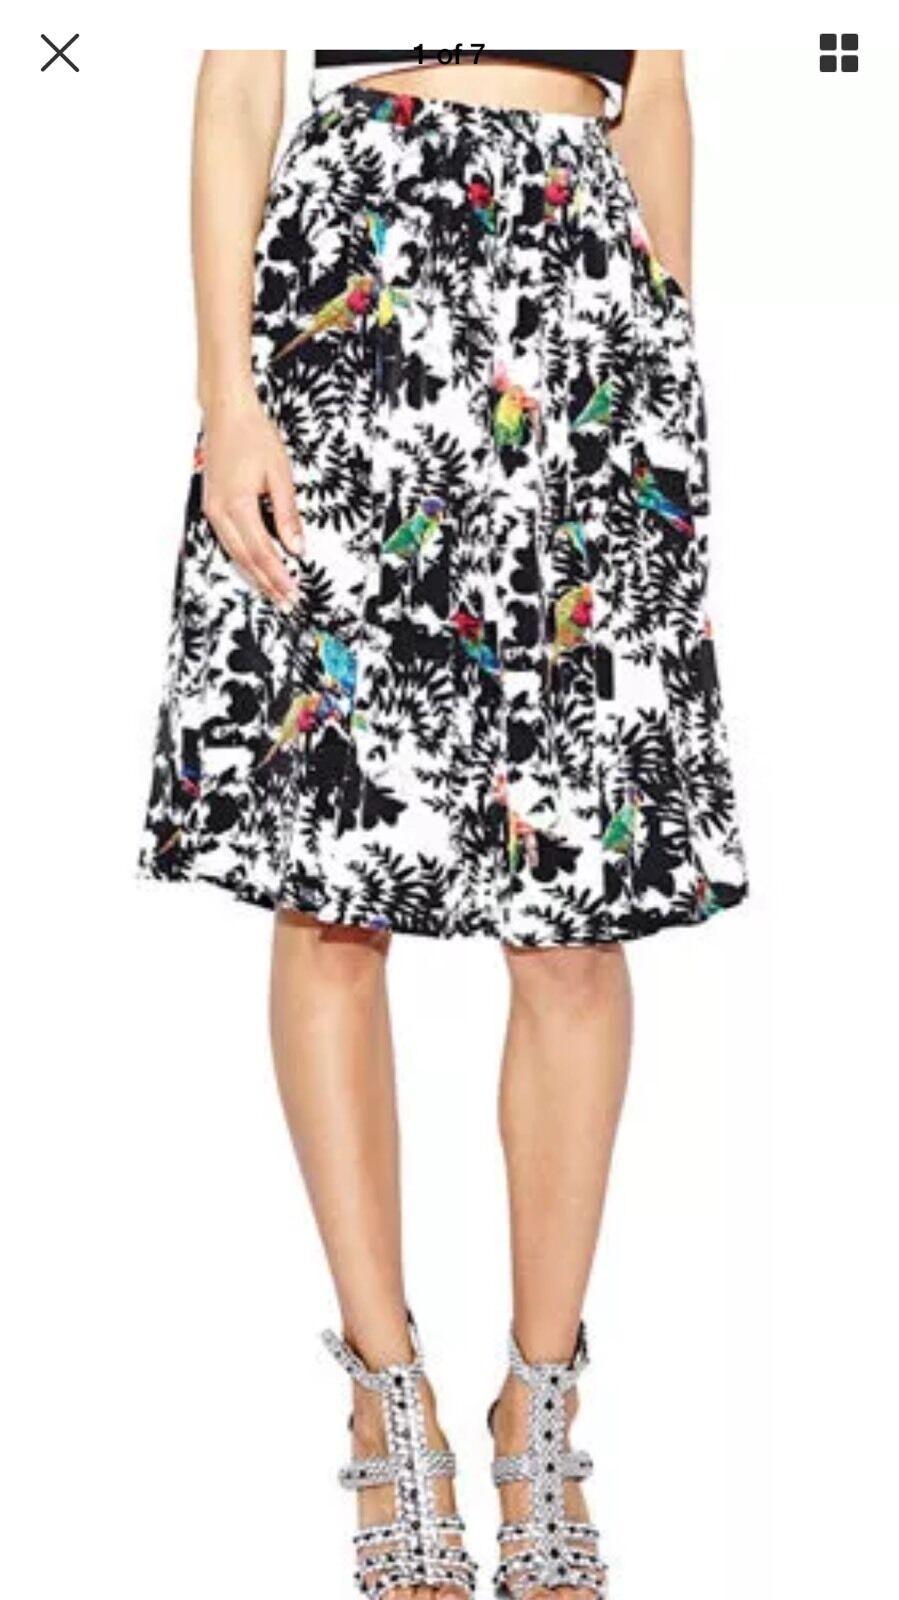 NICOLE MILLER ARTELIER  295 with birds pleated silk skirt Size 8